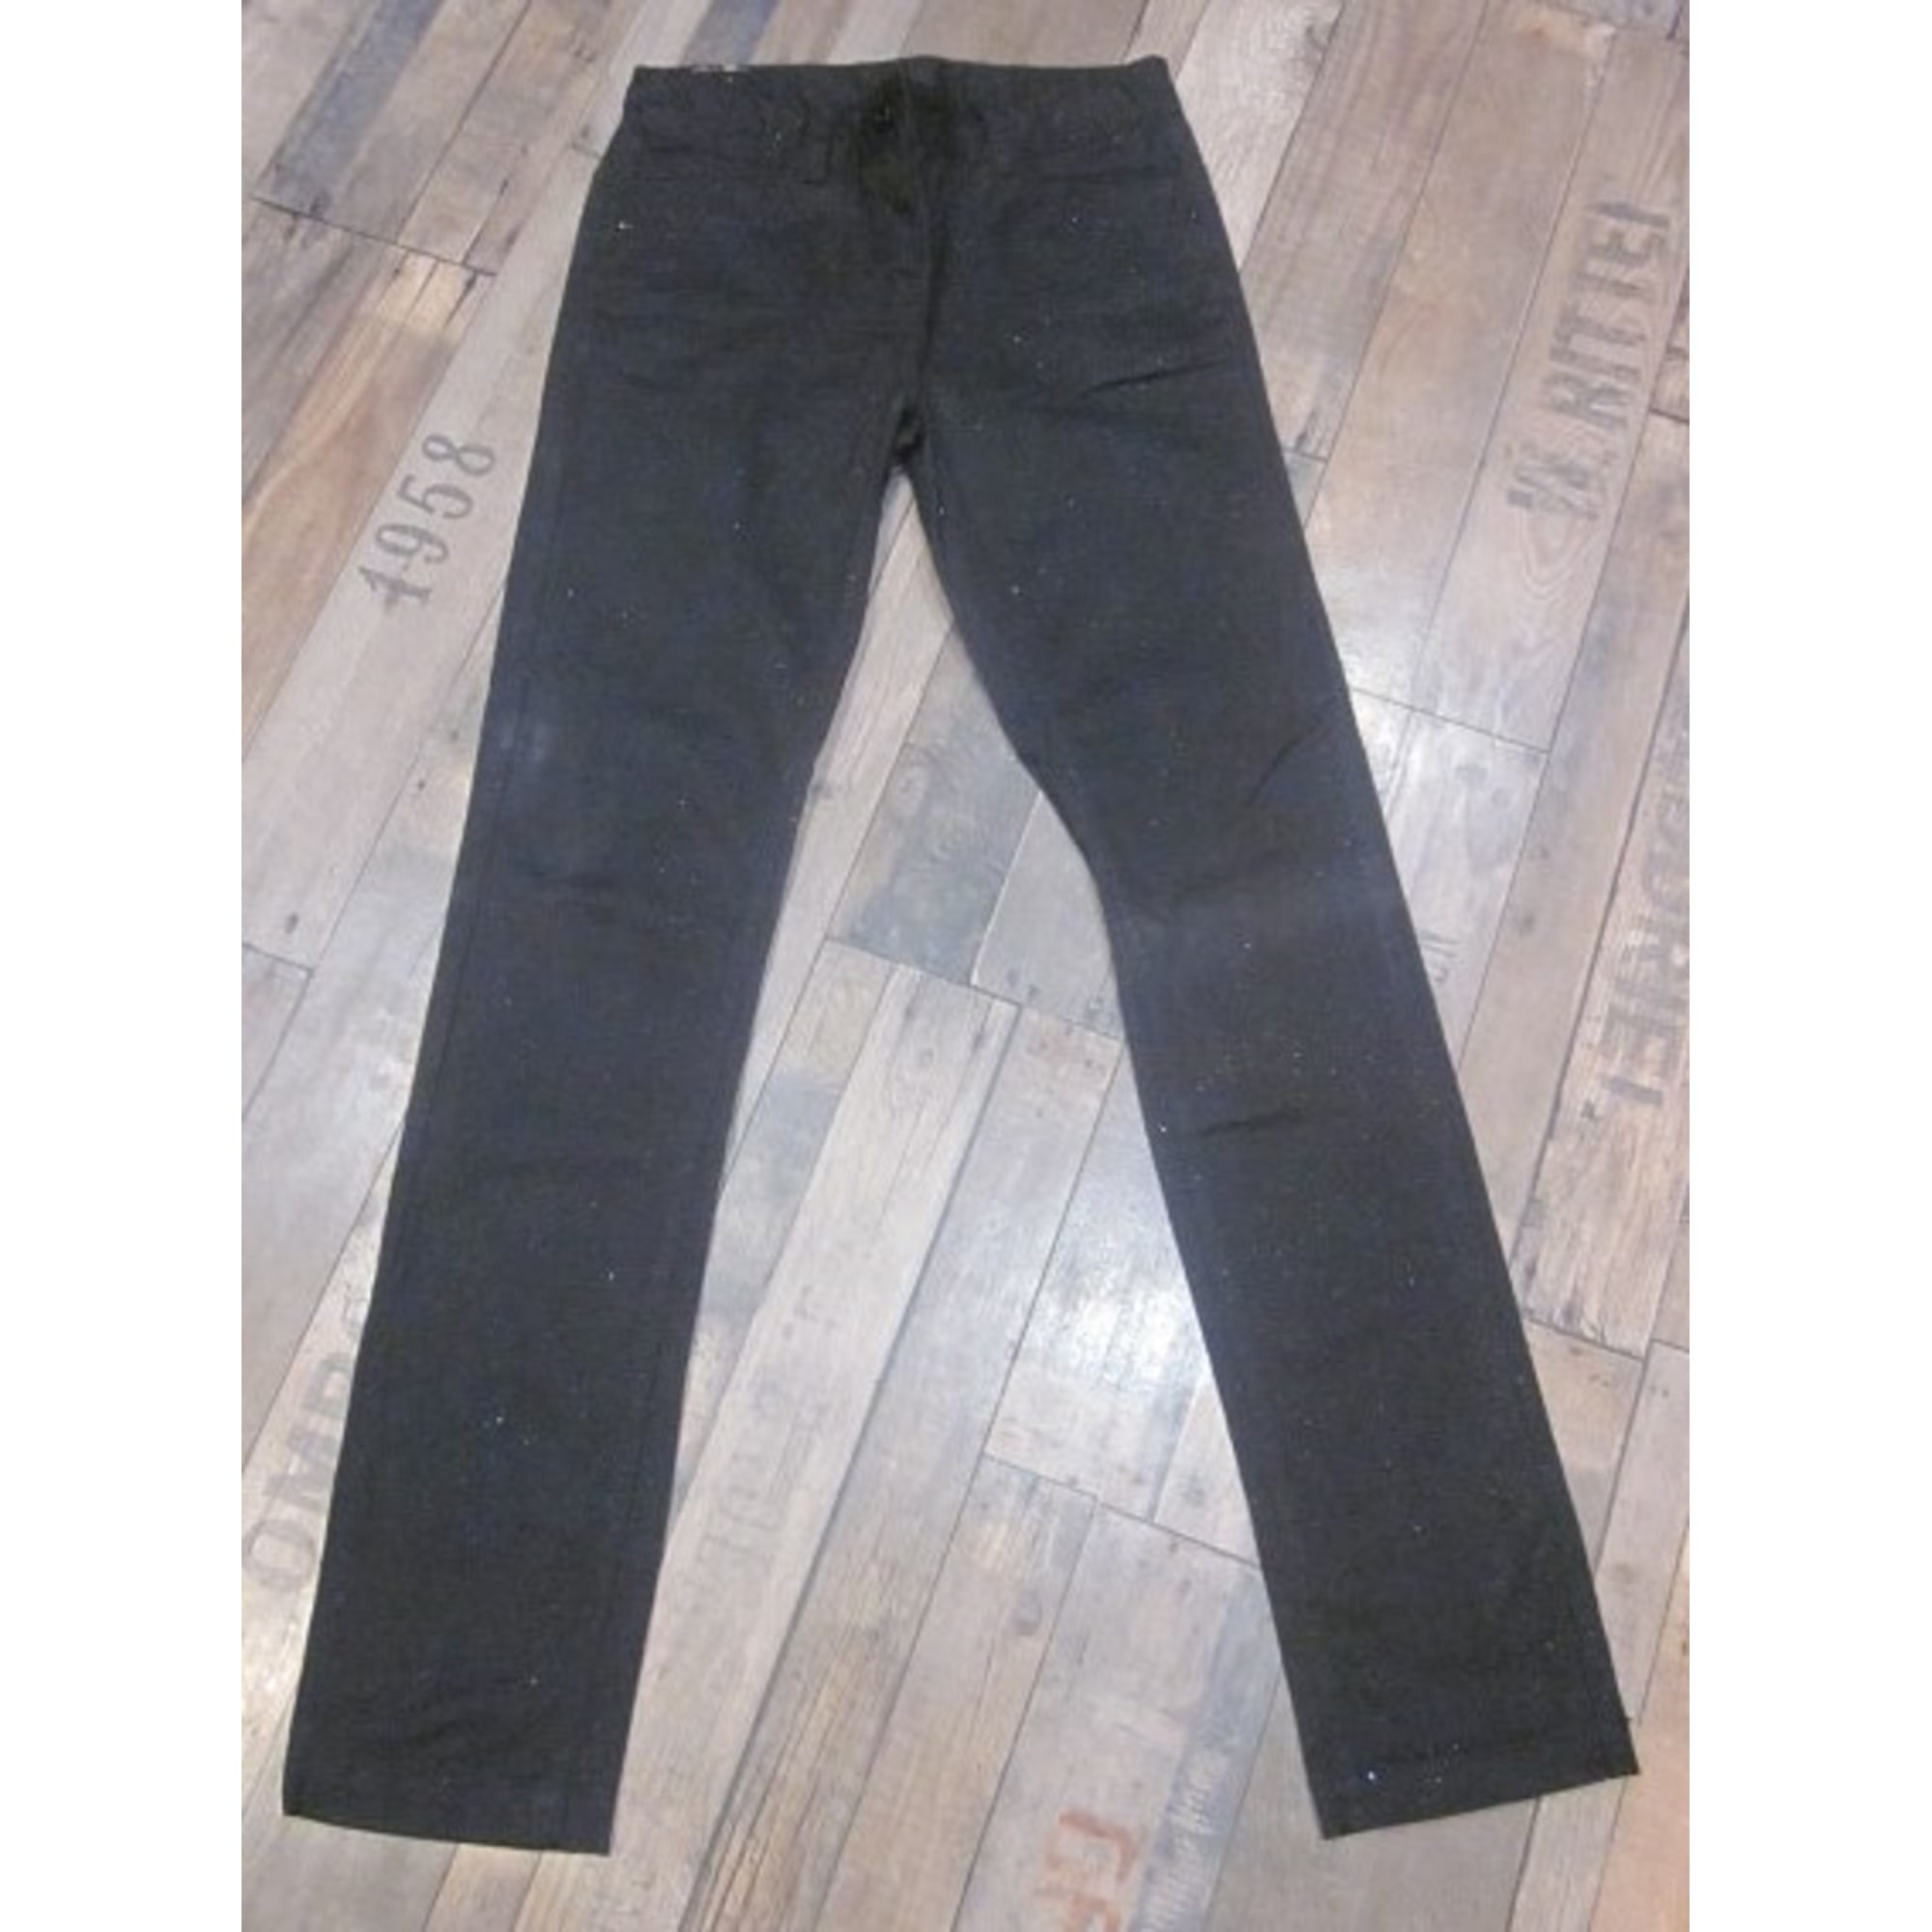 Pantalon BILOOK Noir